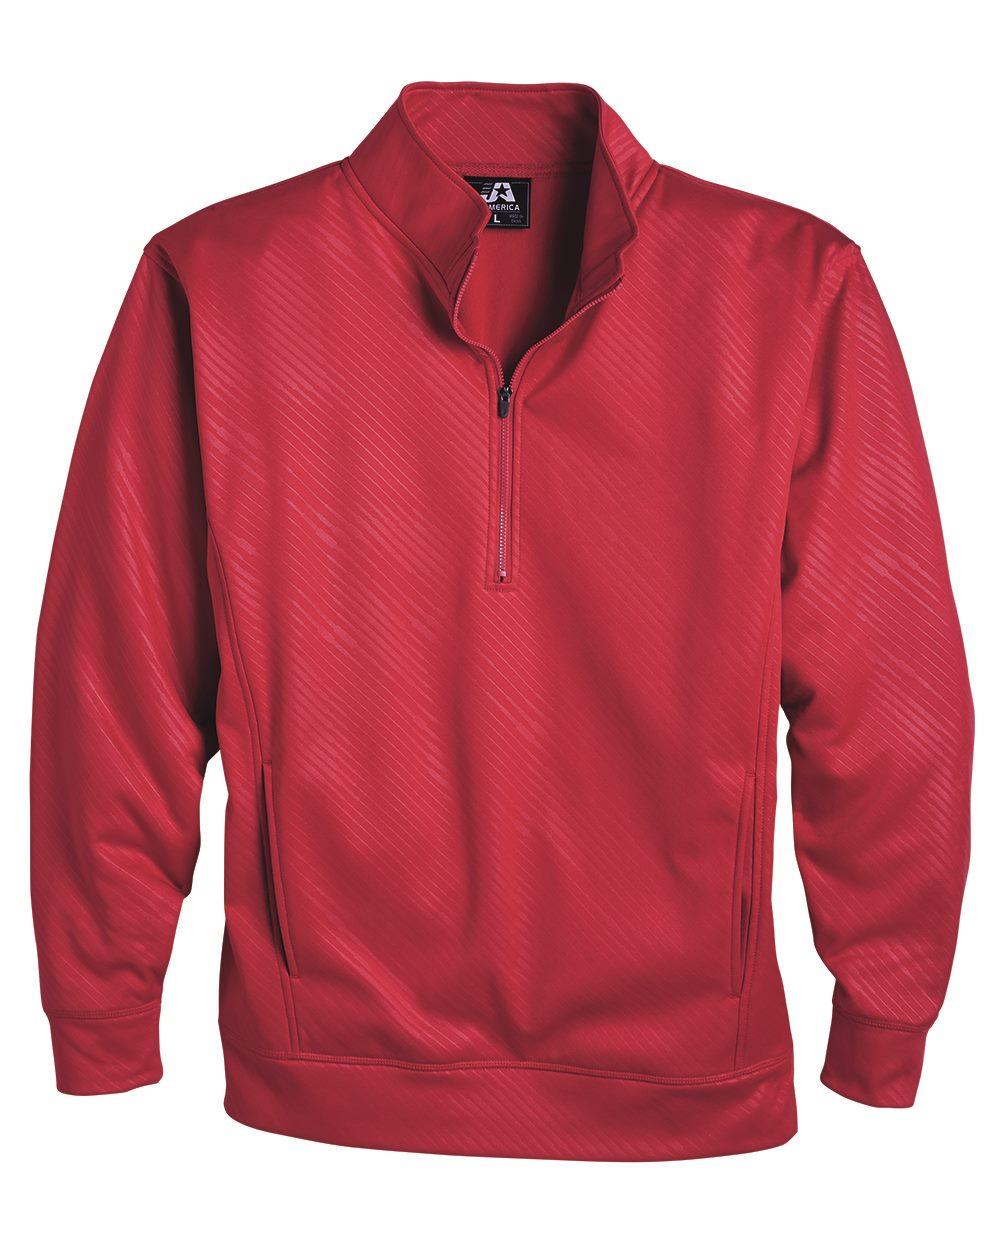 J. America 8669 - Volt Polyester Quarter-Zip Sweatshirt